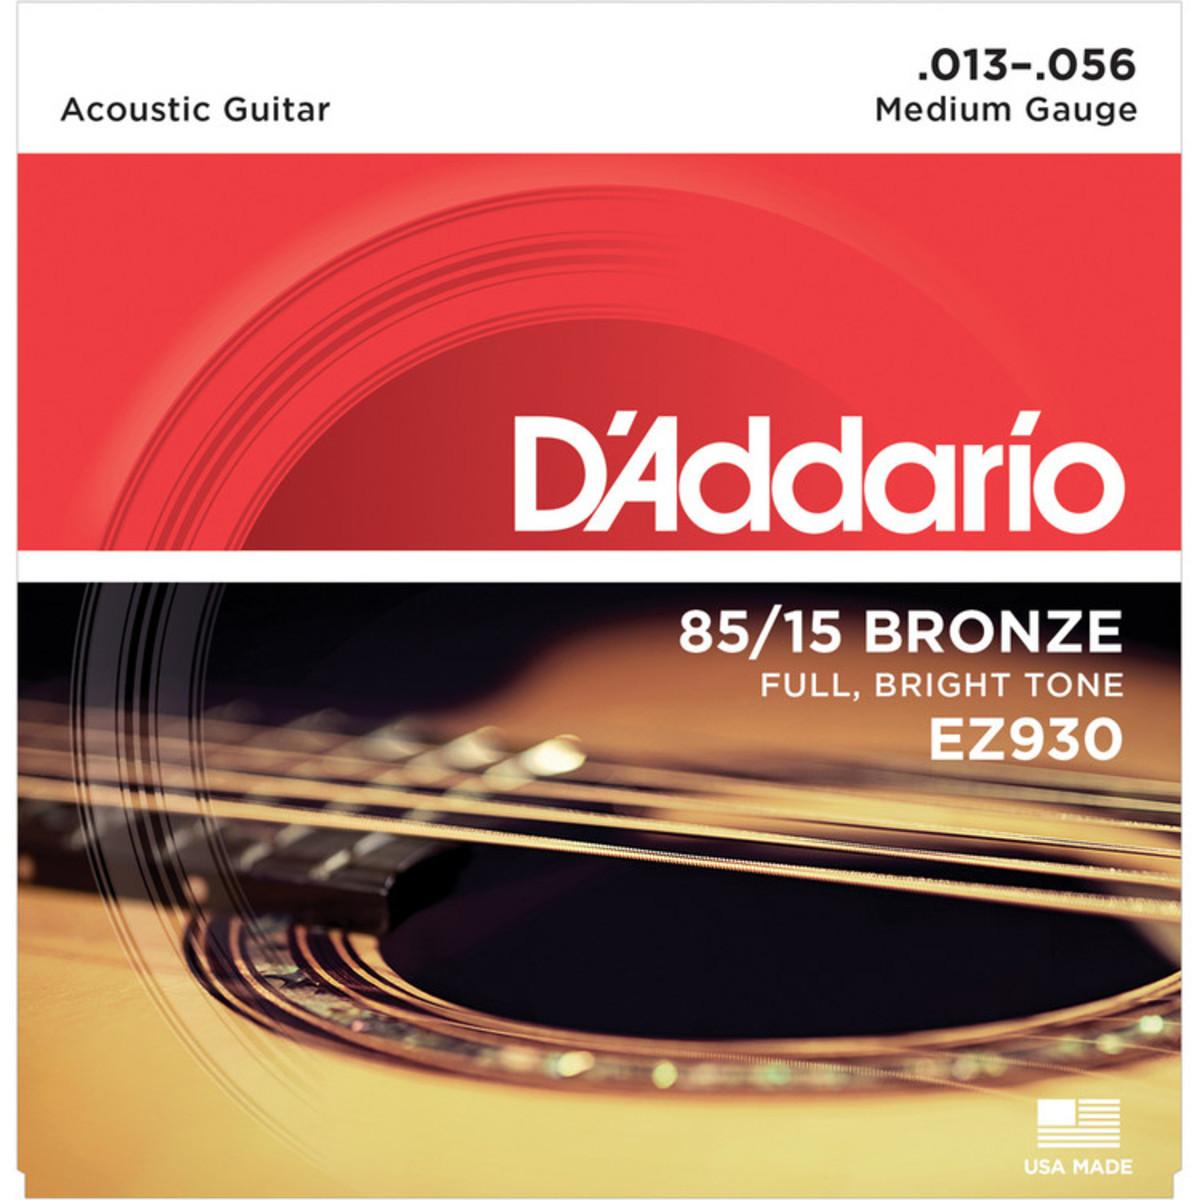 Daddario EZ930 Guitar Strings 13-56